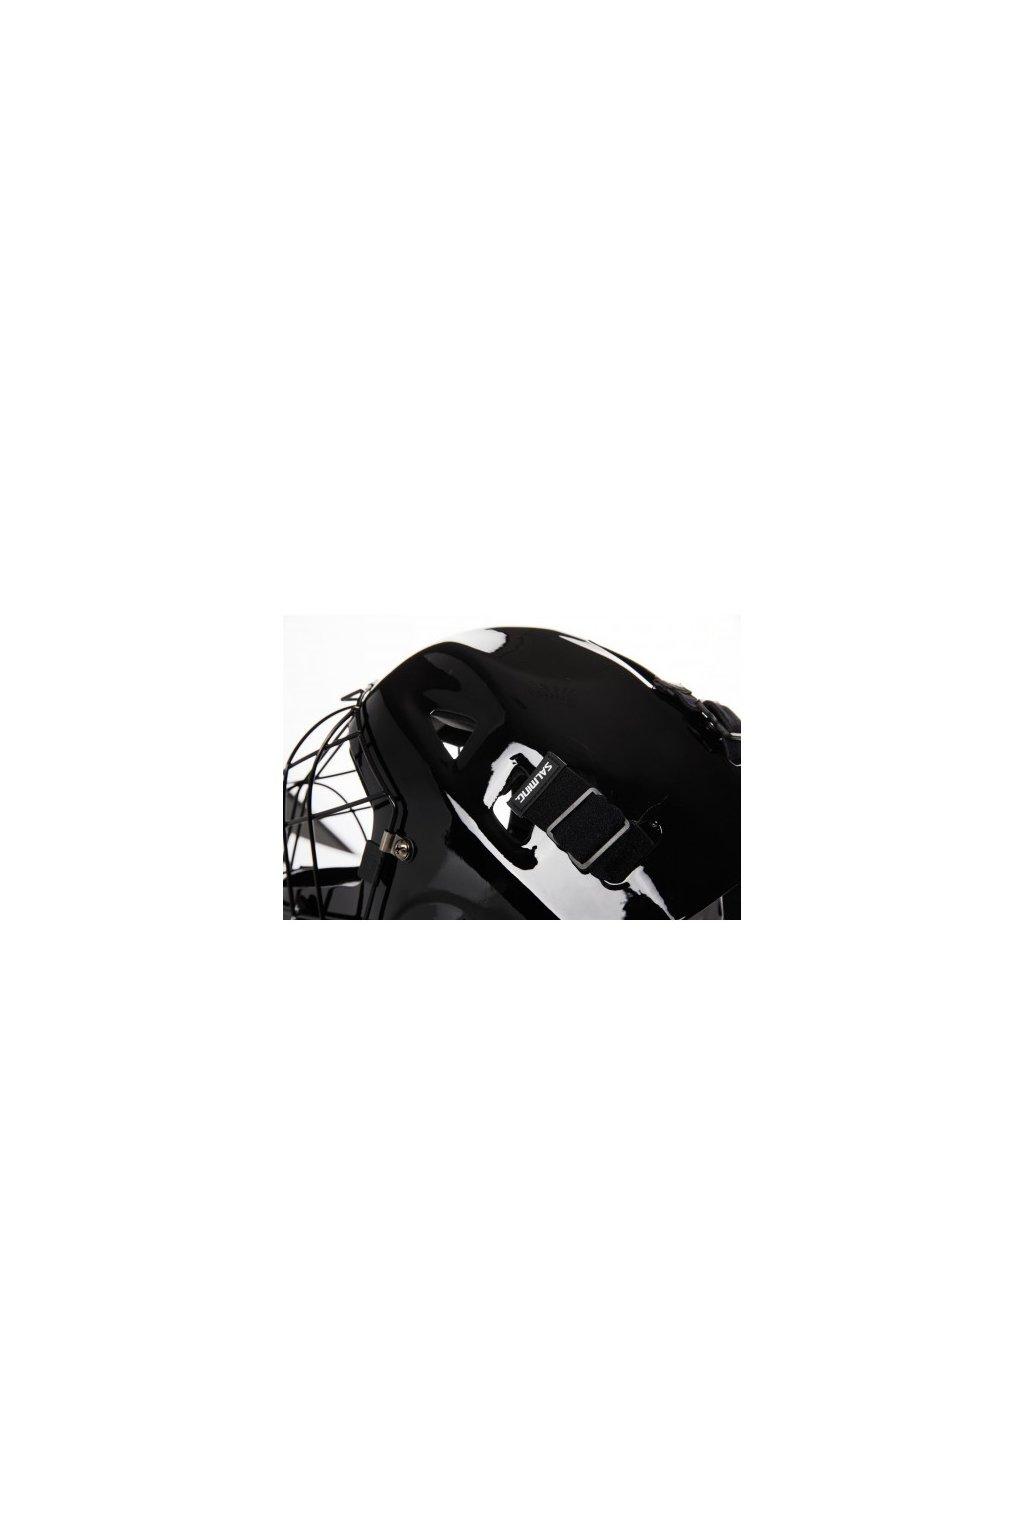 salming carbonx helmet strapsbuckles black